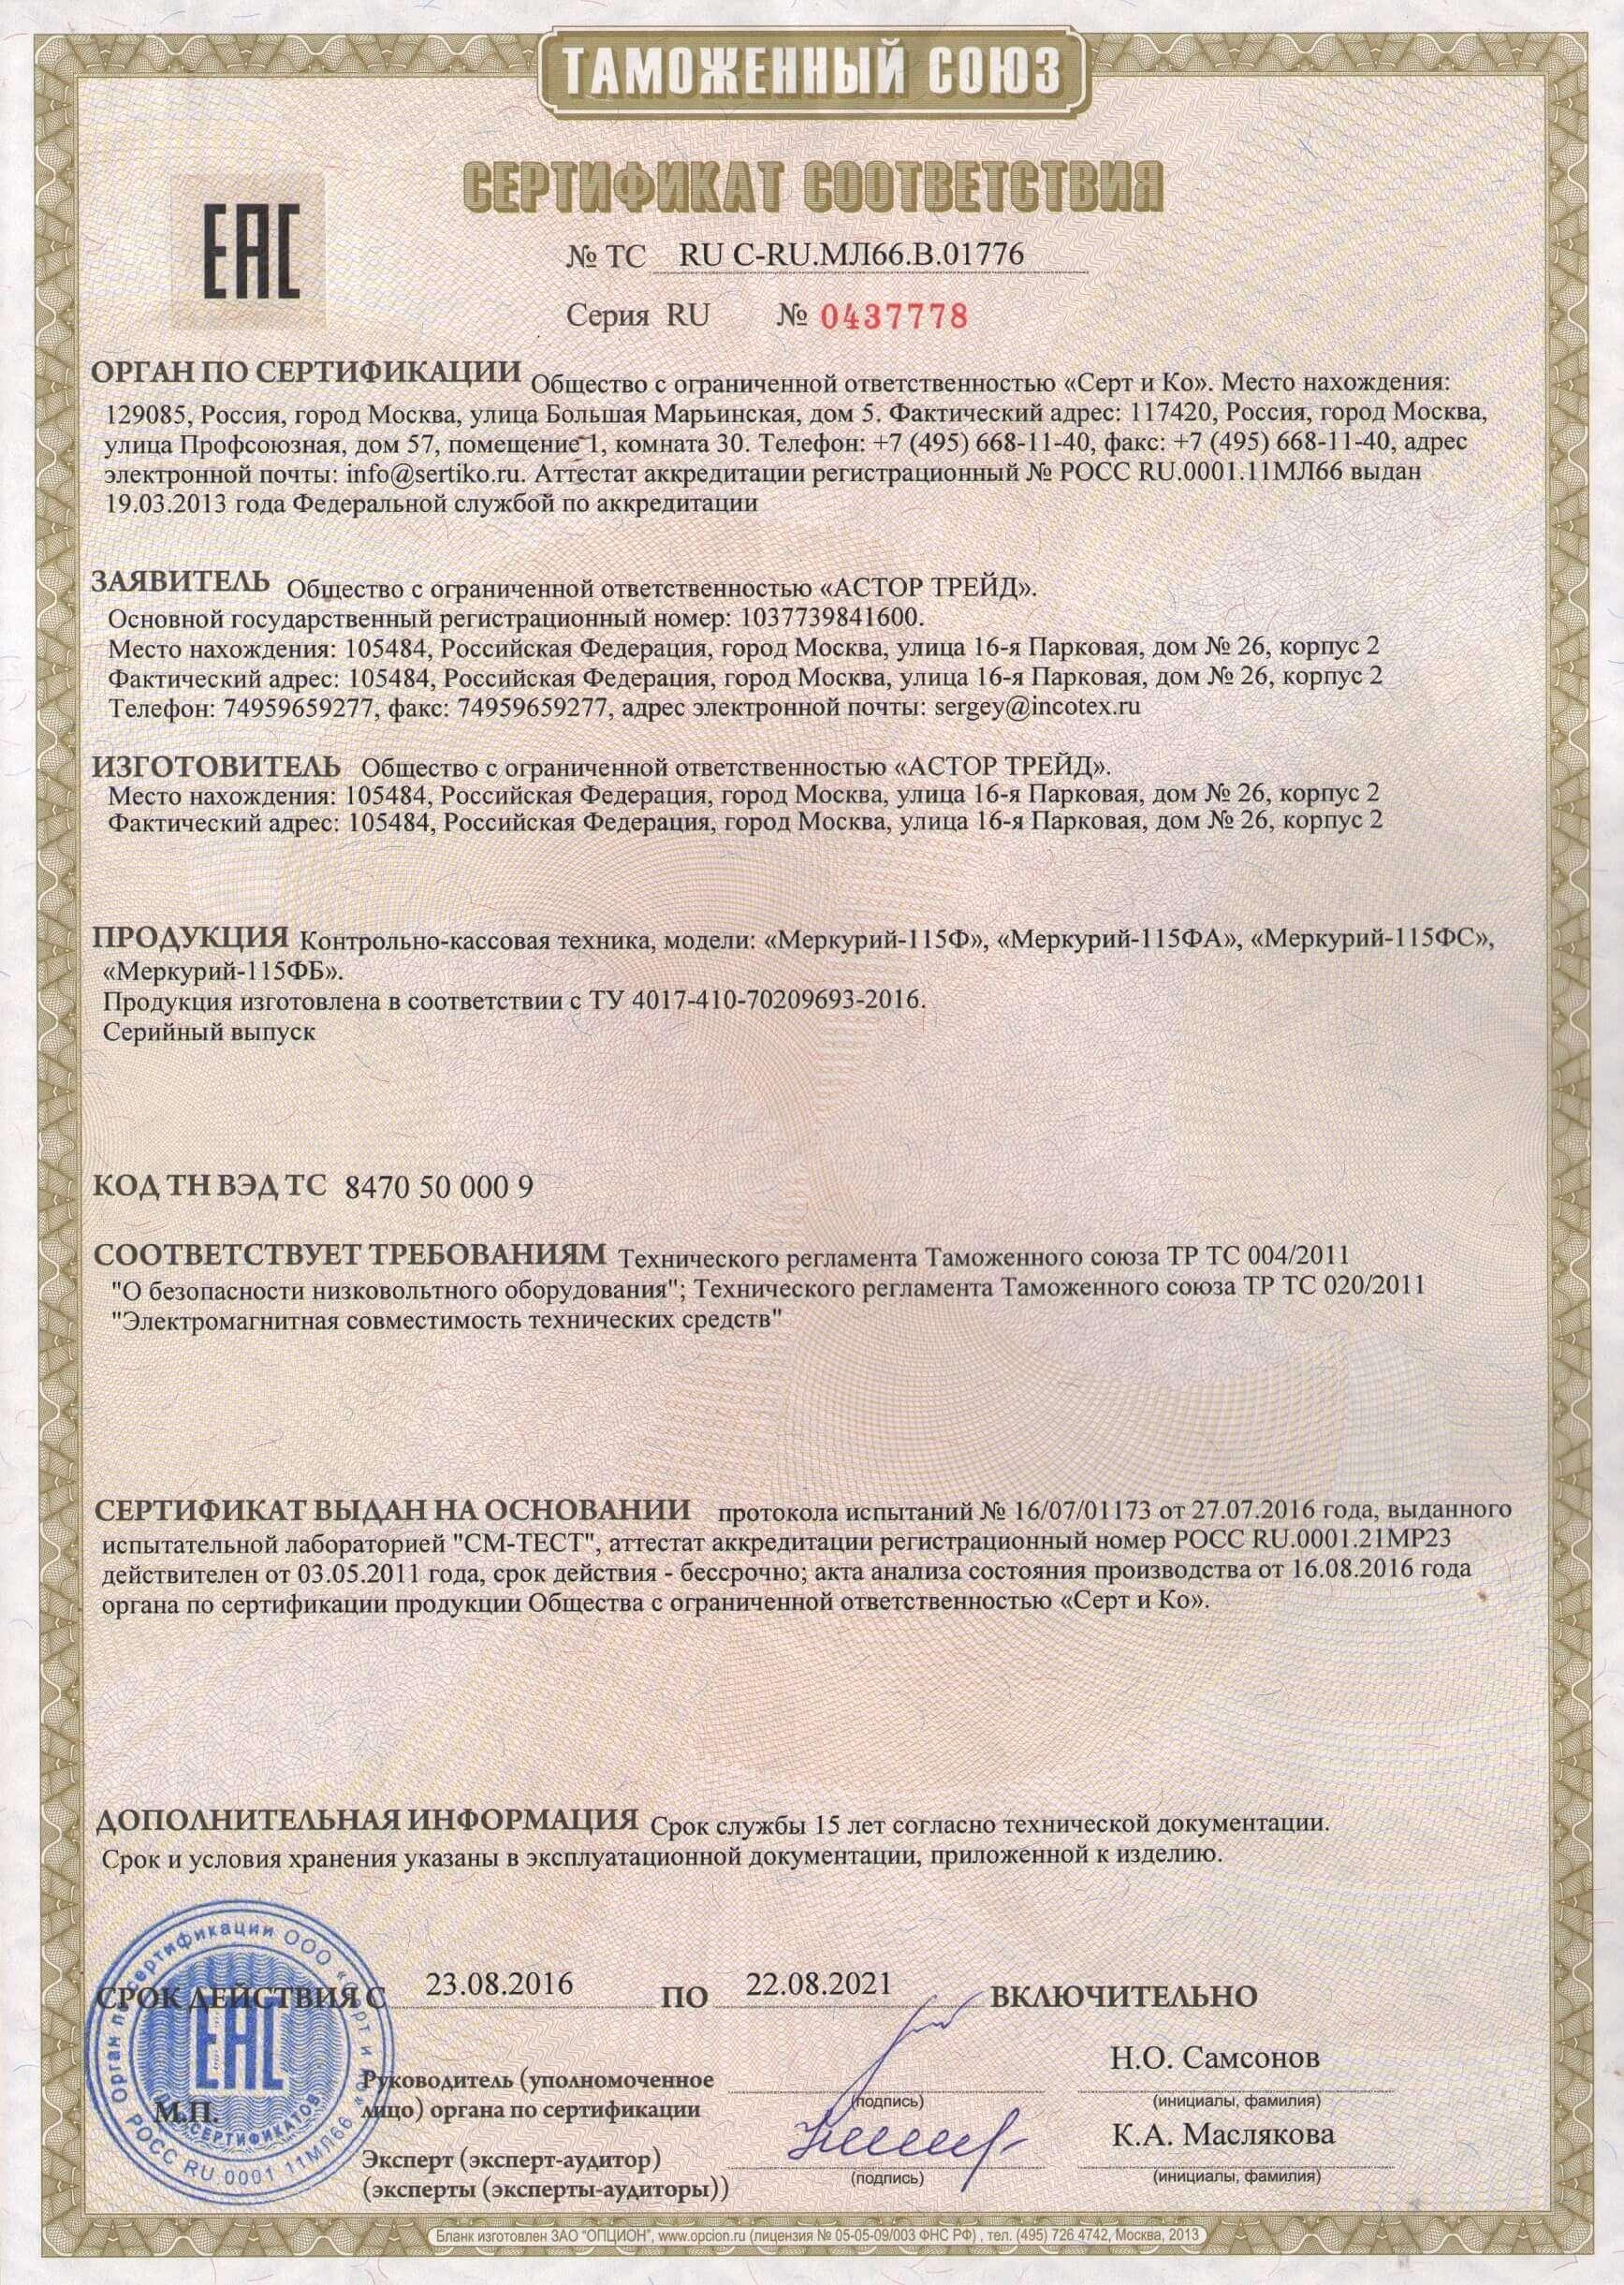 сертификат соответствия на онлайн кассу Меркурий 115Ф